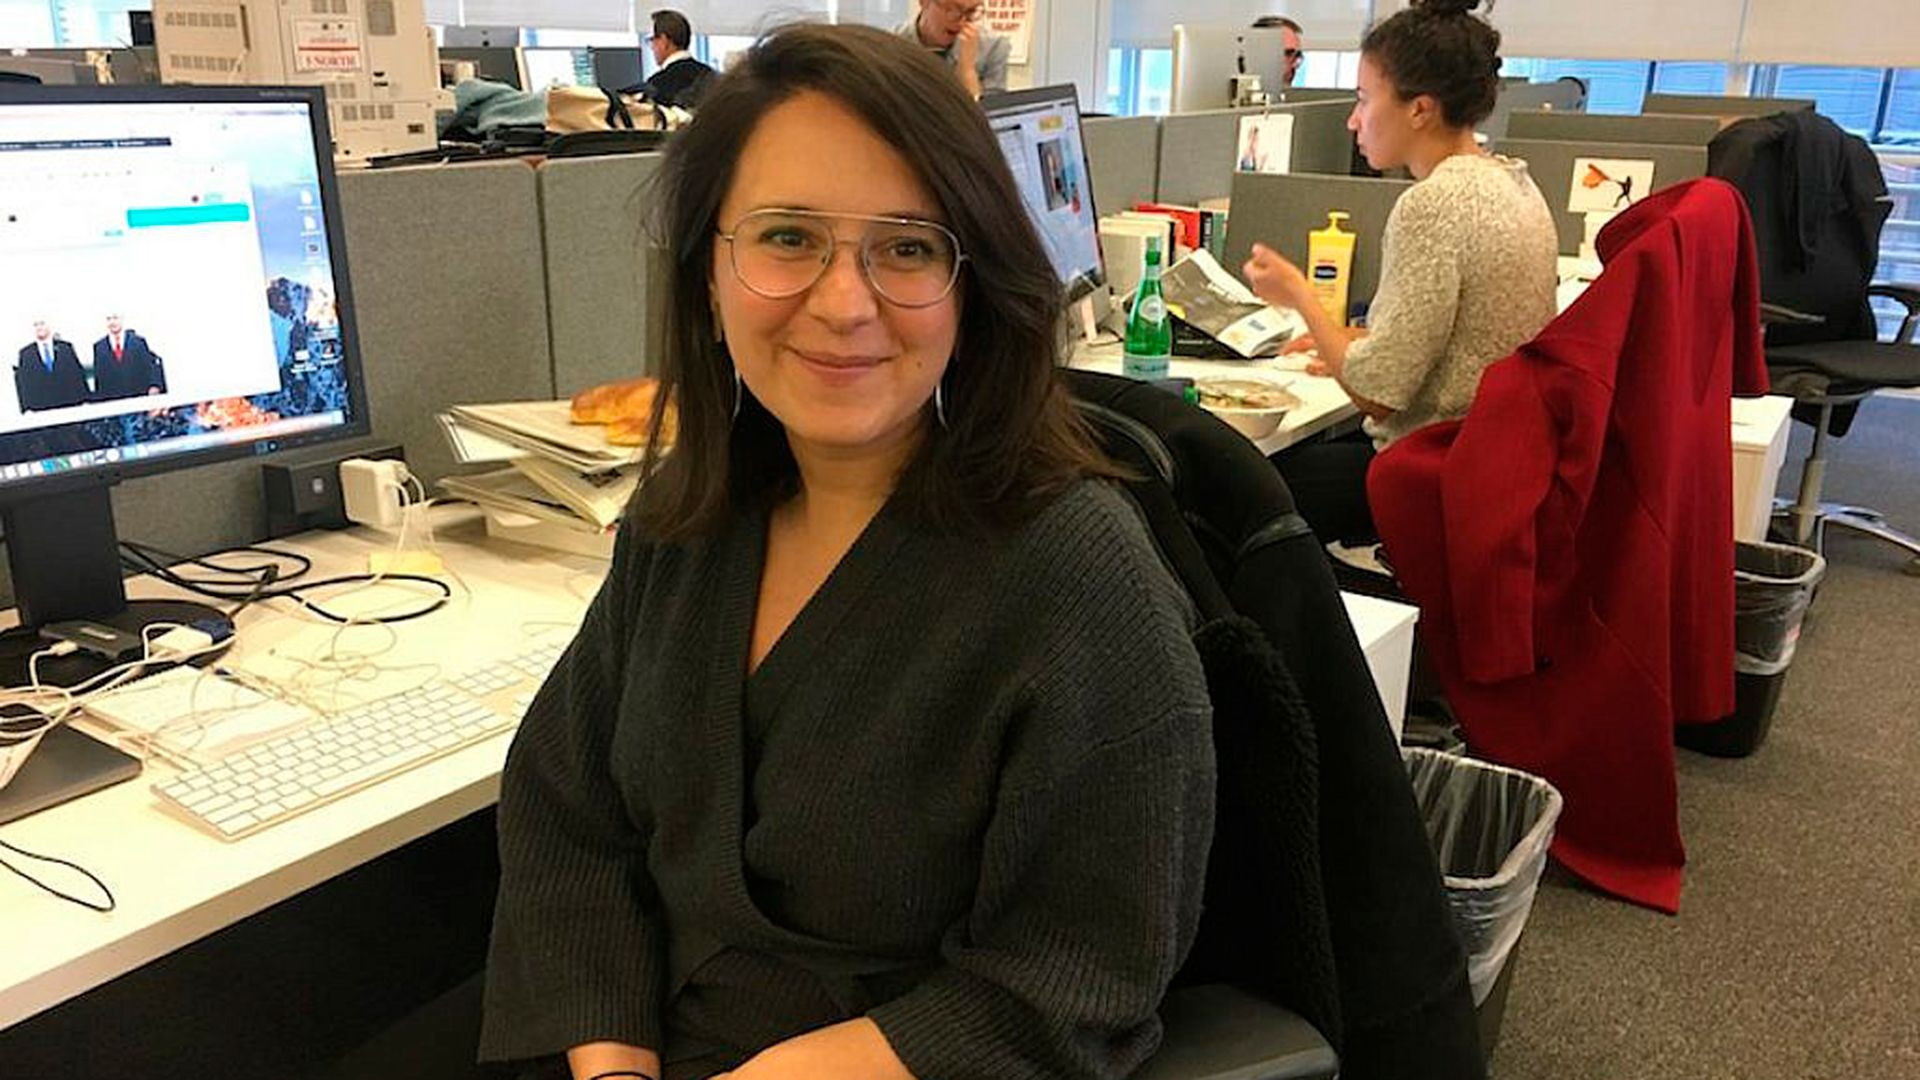 Bari Weiss , editora de The New York Times